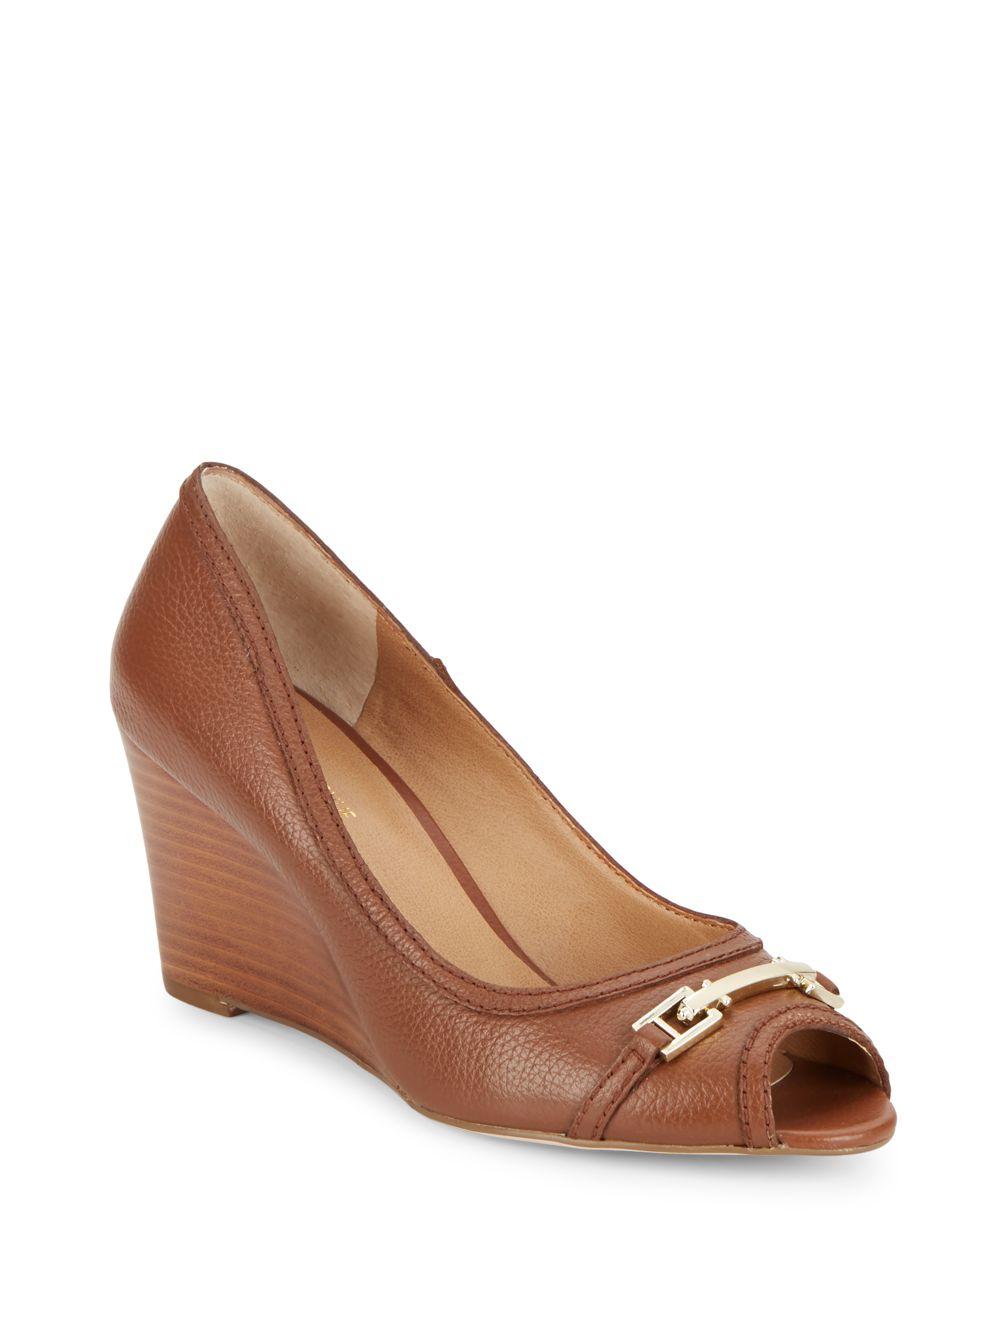 saks fifth avenue leather peep toe wedges in brown lyst